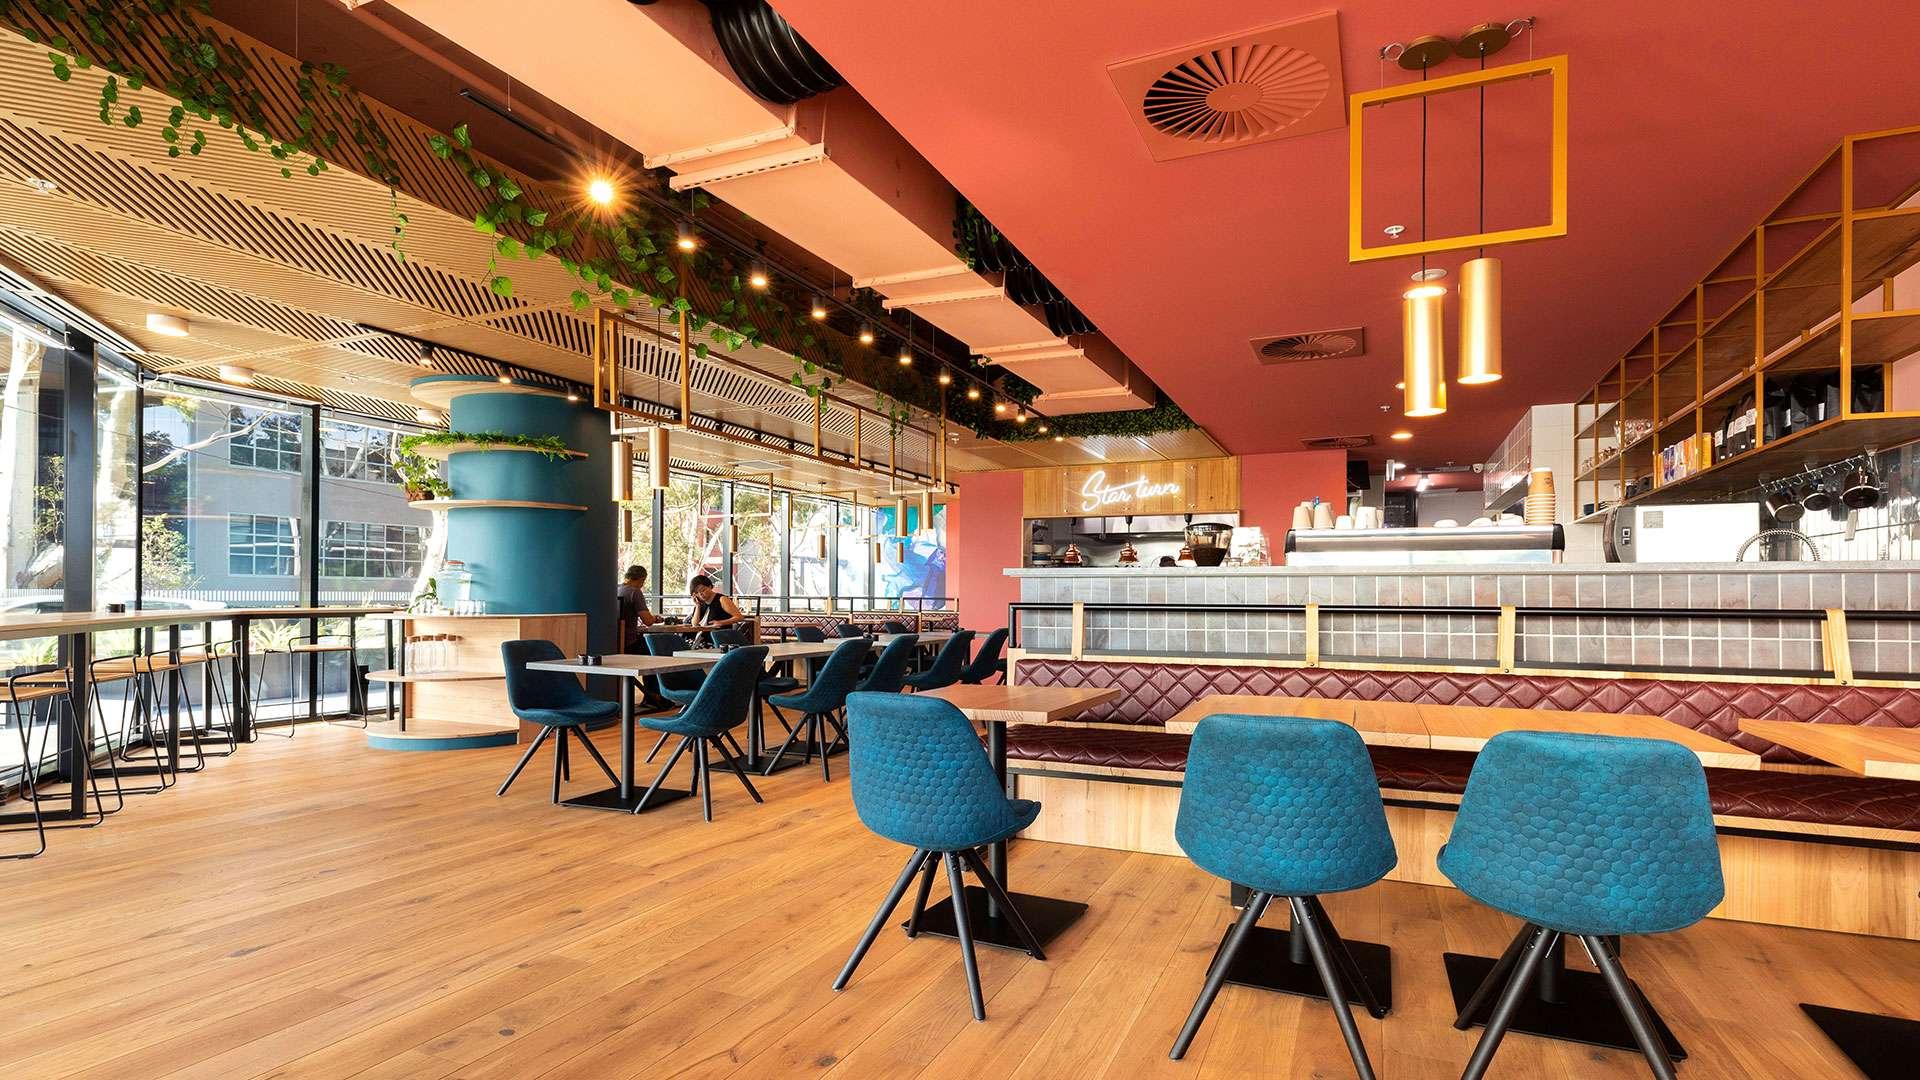 Star Turn Cafe Restaurant_01